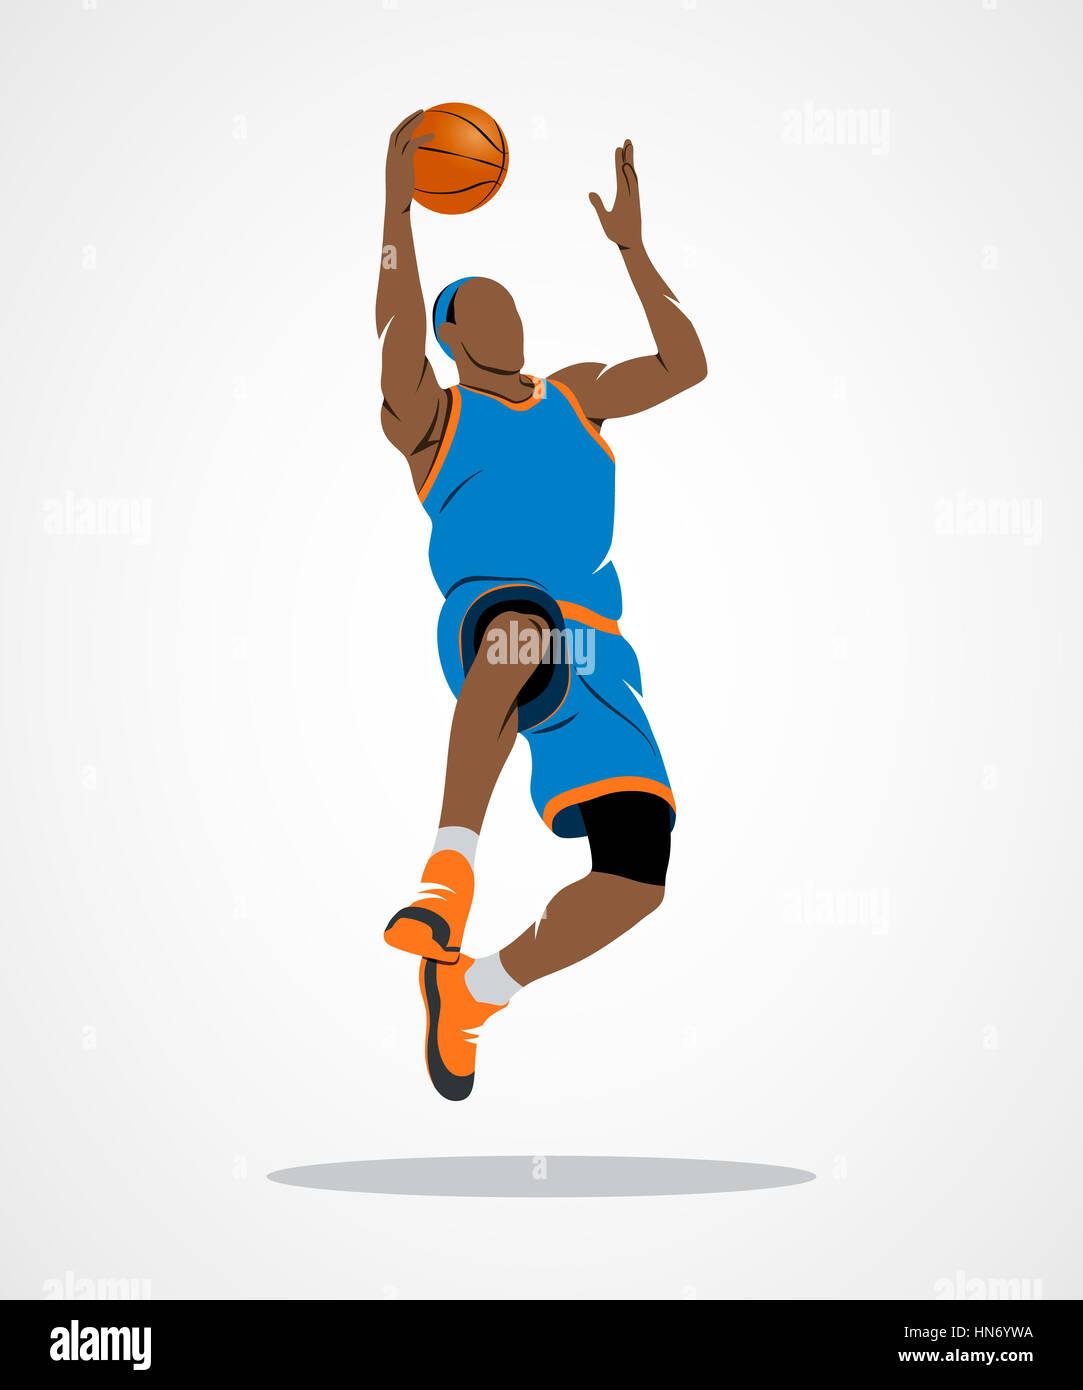 Berühmt Basketball Trainer Fortsetzen Ziel Bilder - Entry Level ...